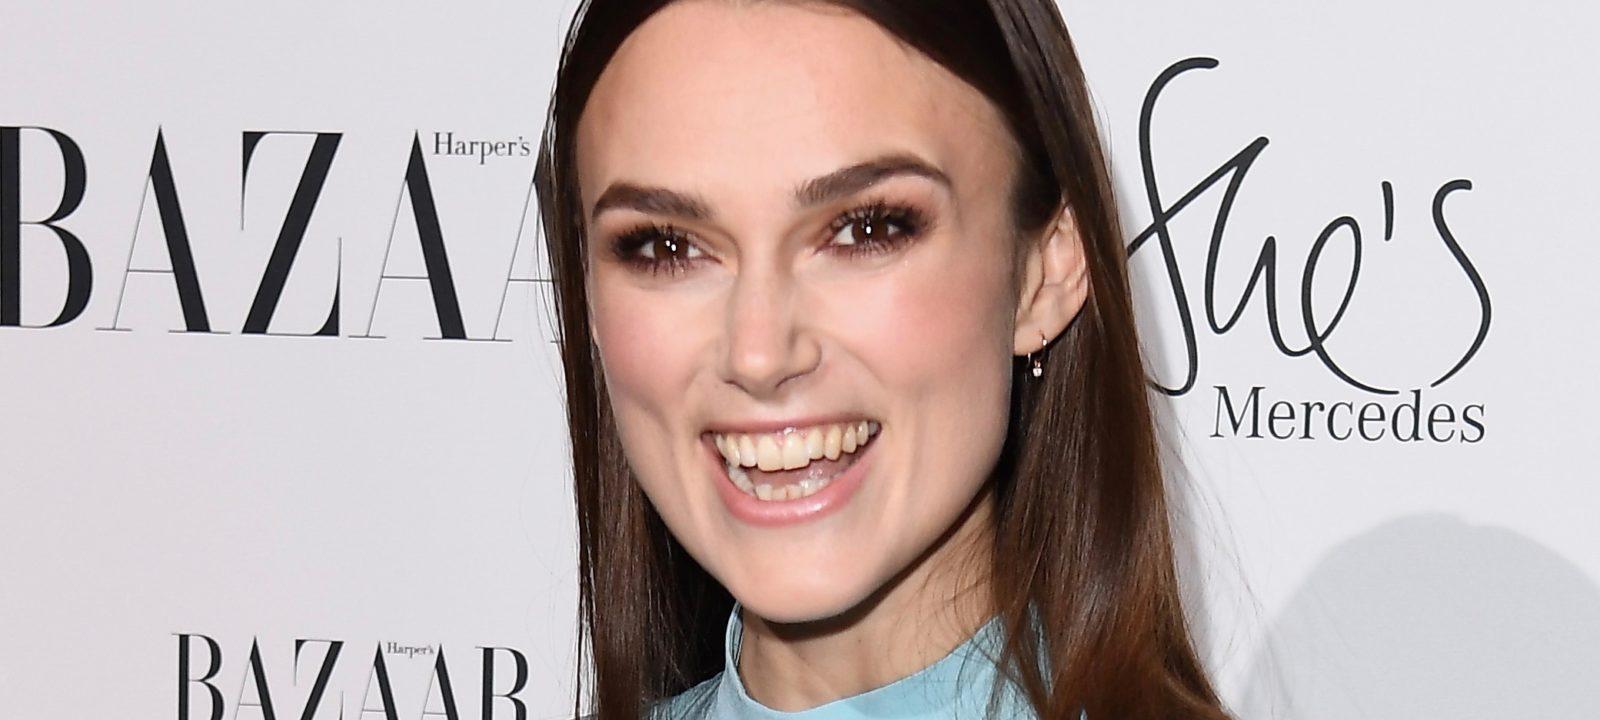 Harper's Bazaar Women of the Year Awards – Red Carpet Arrivals